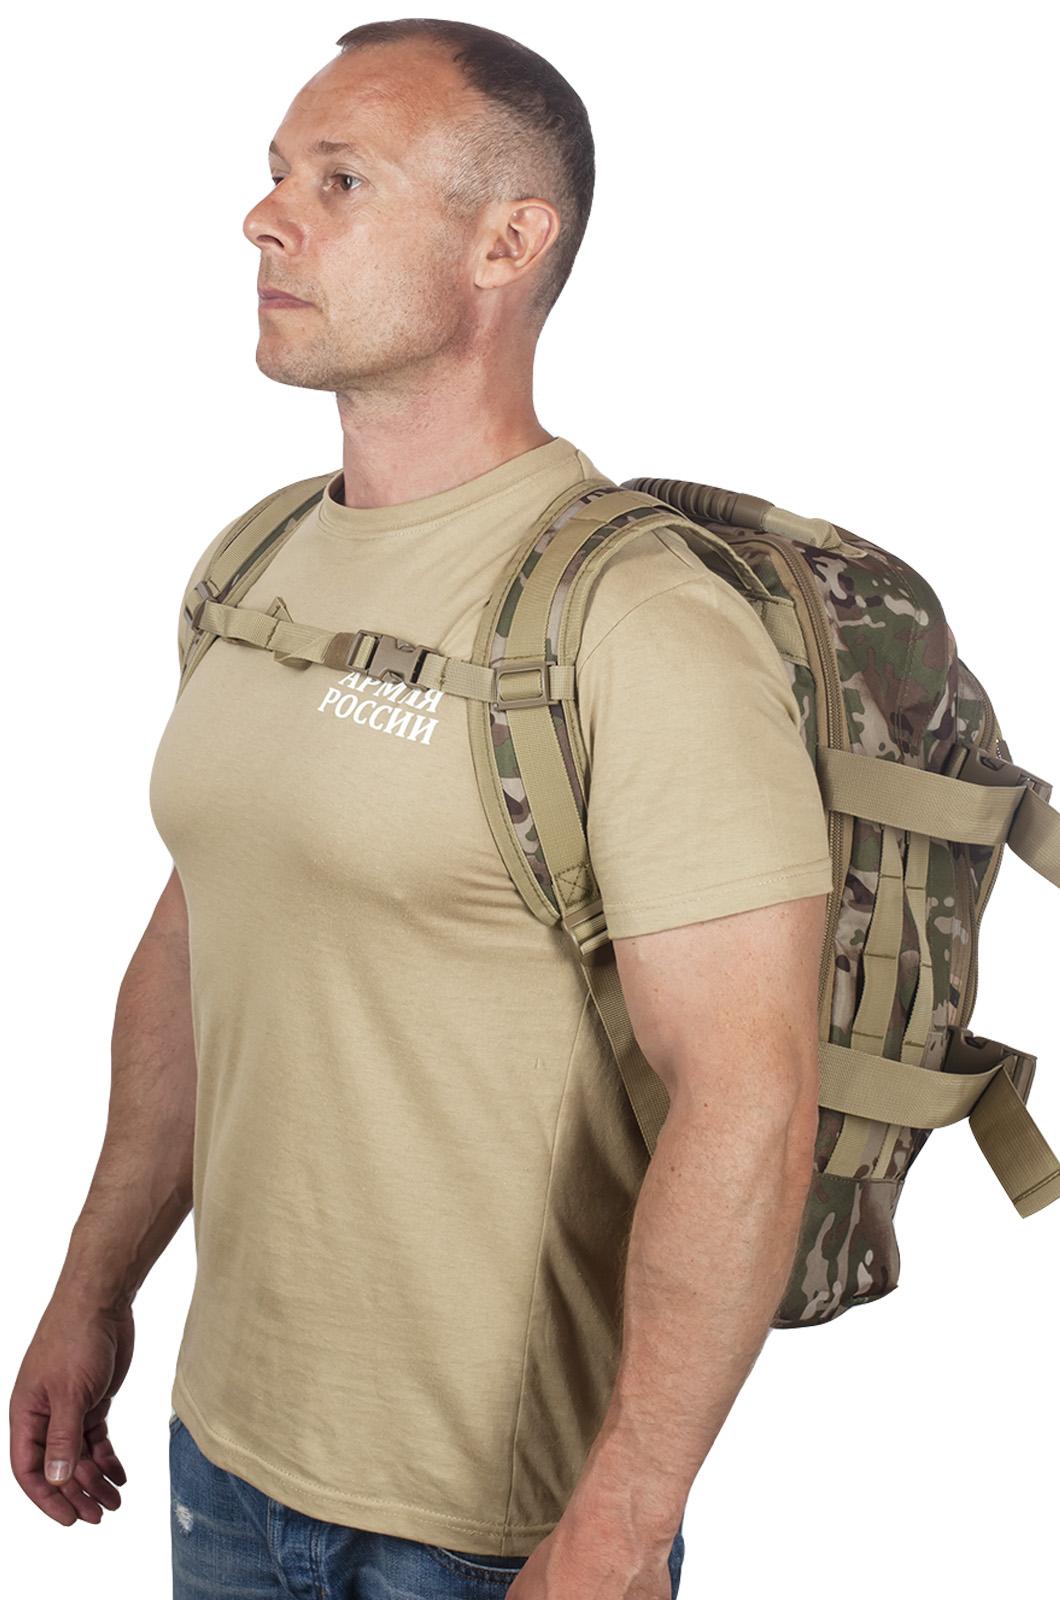 Штурмовой рюкзак спецназа 3-Day Expandable Backpack 08002B OCP по выгодной цене